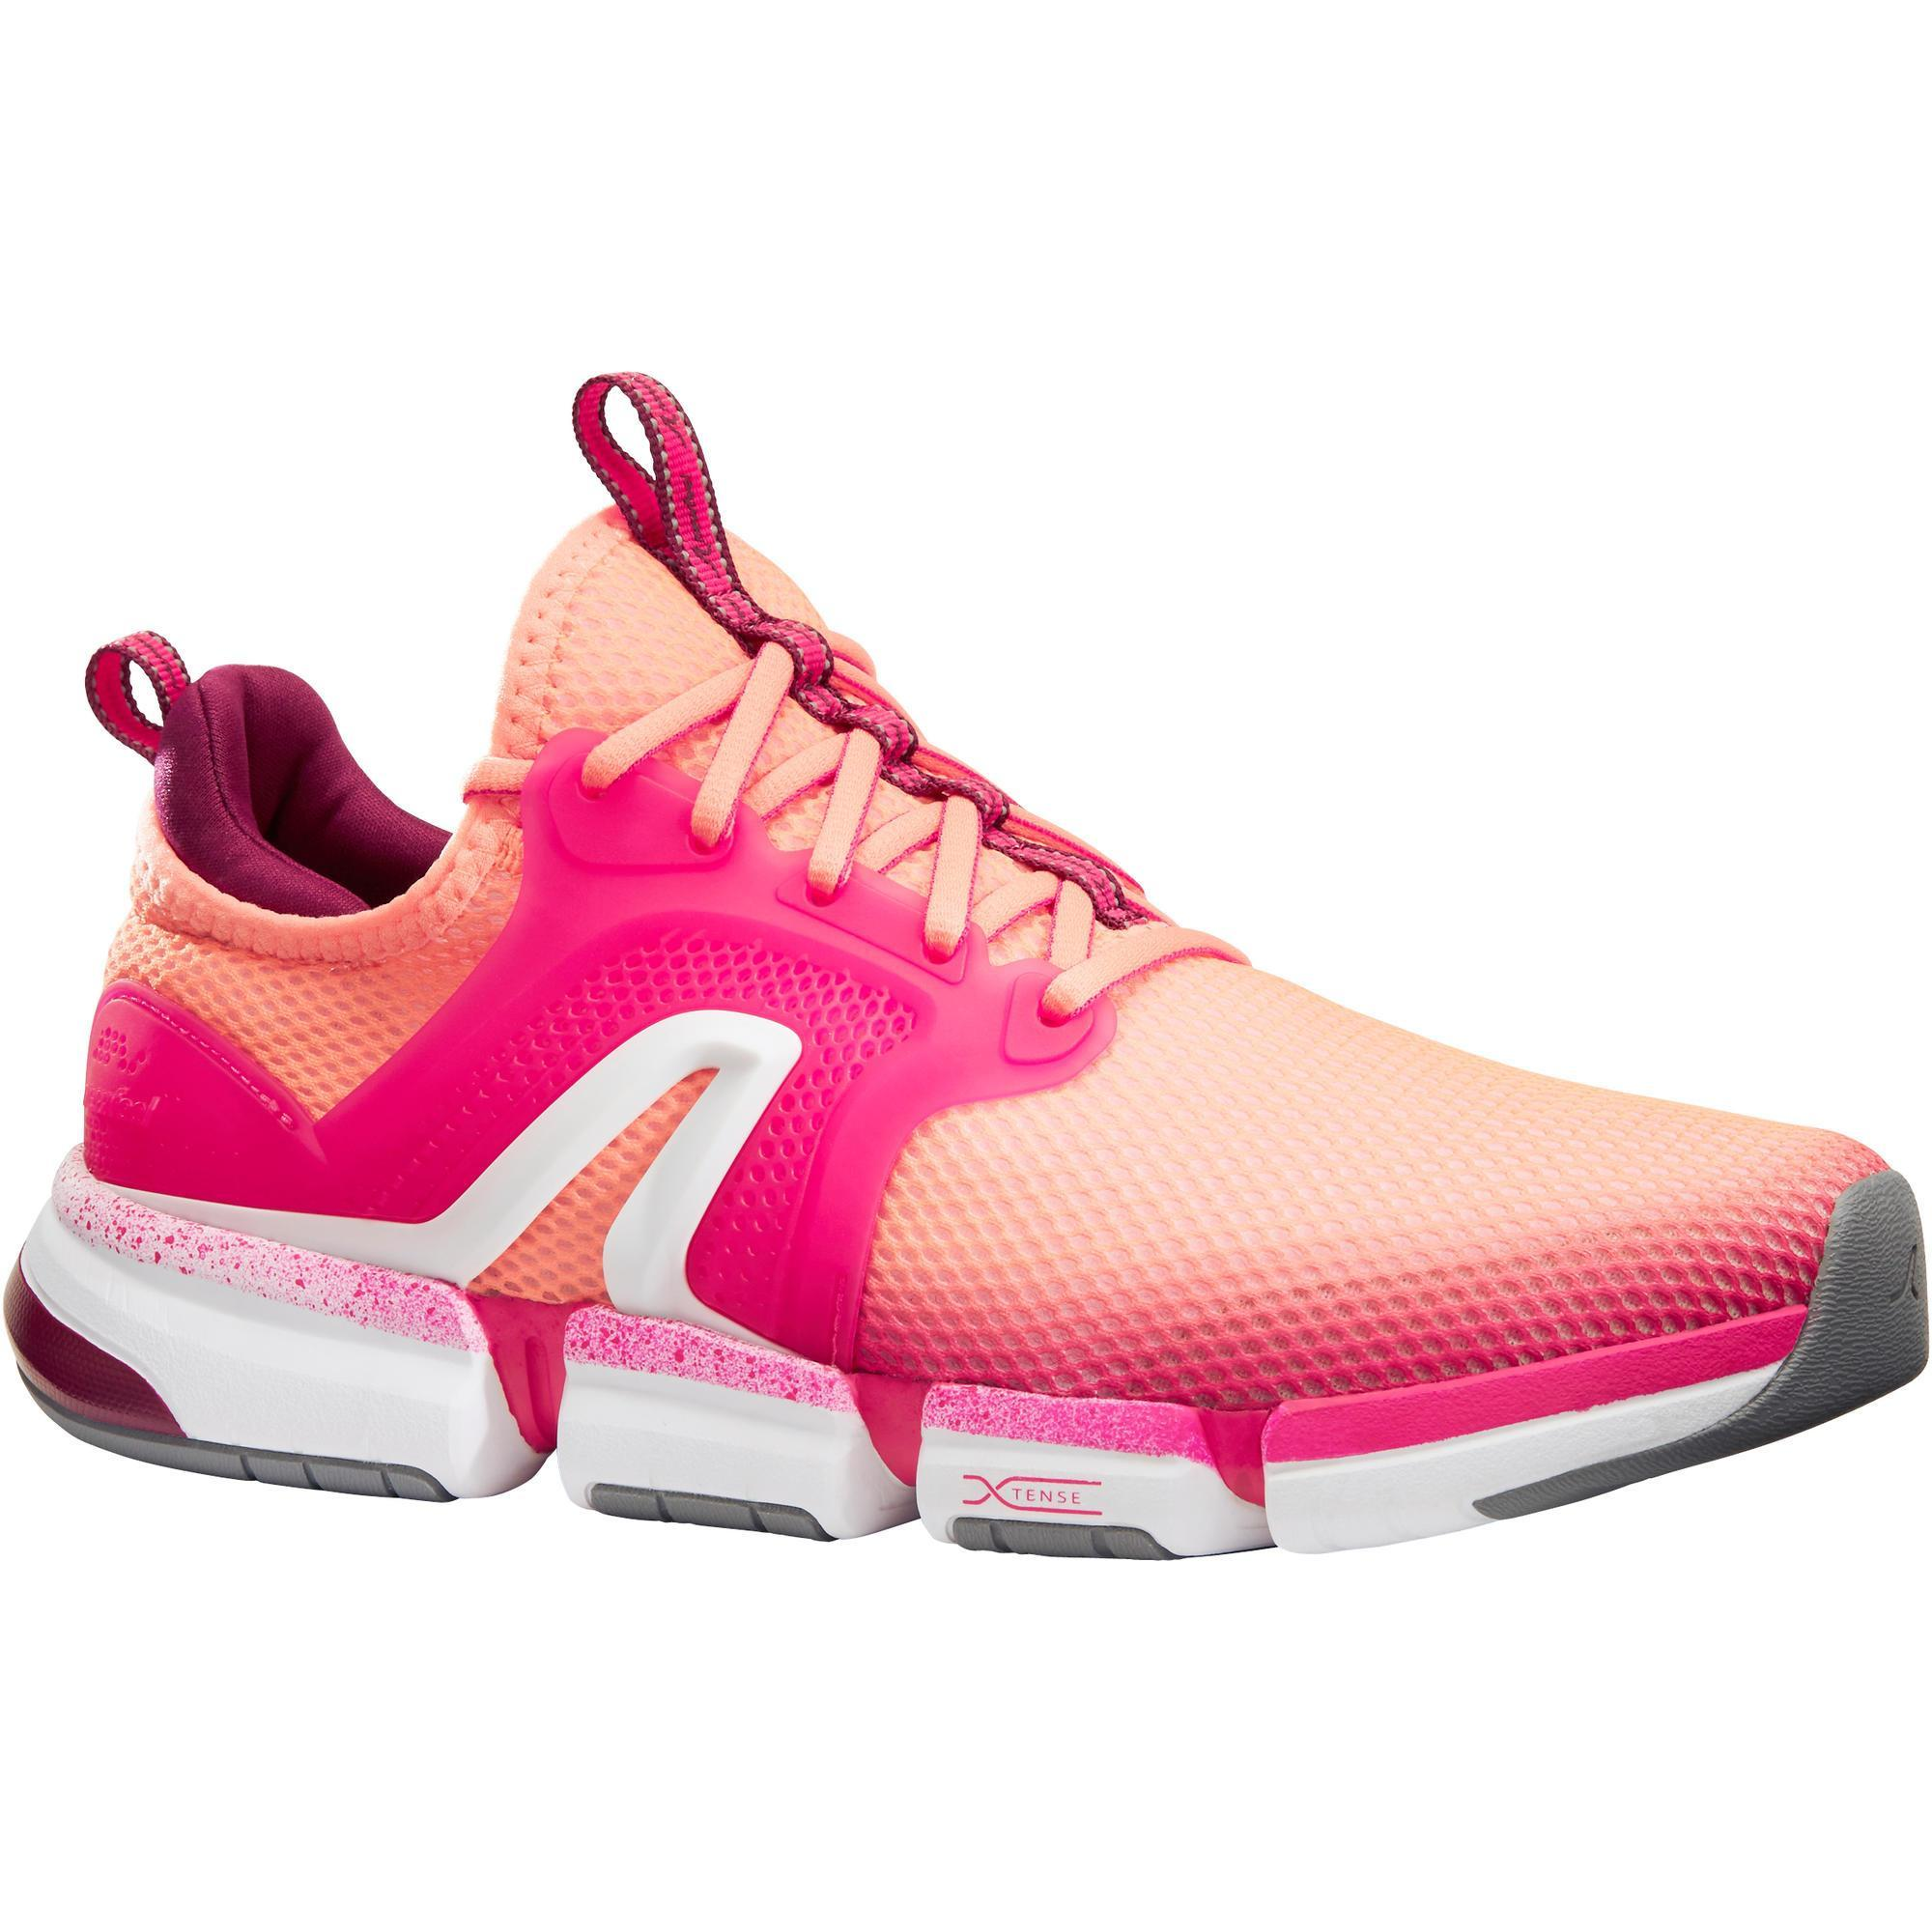 chaussures de basket femme decathlon